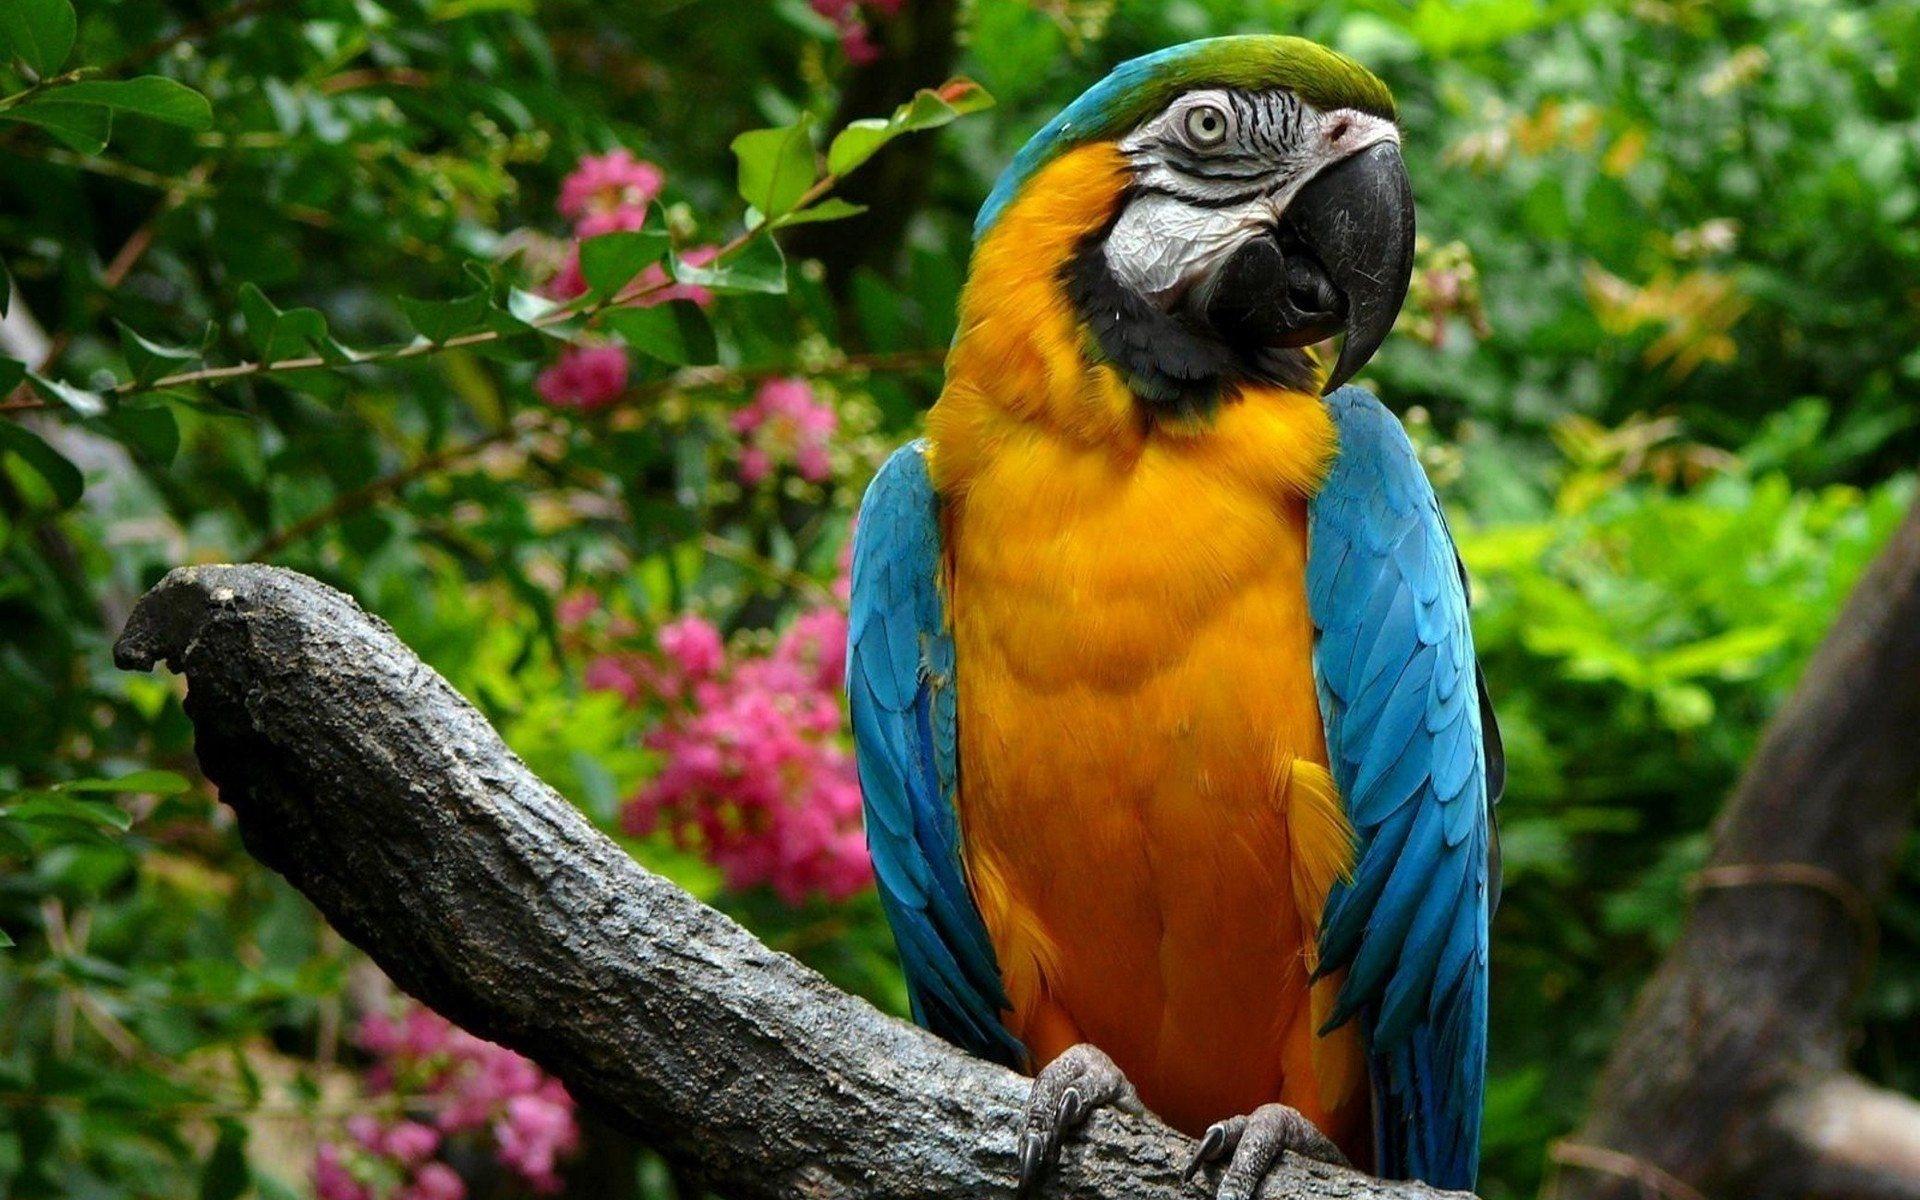 parrot 1080p wallpaper wide screen wallpaper 1080p 2k 4k